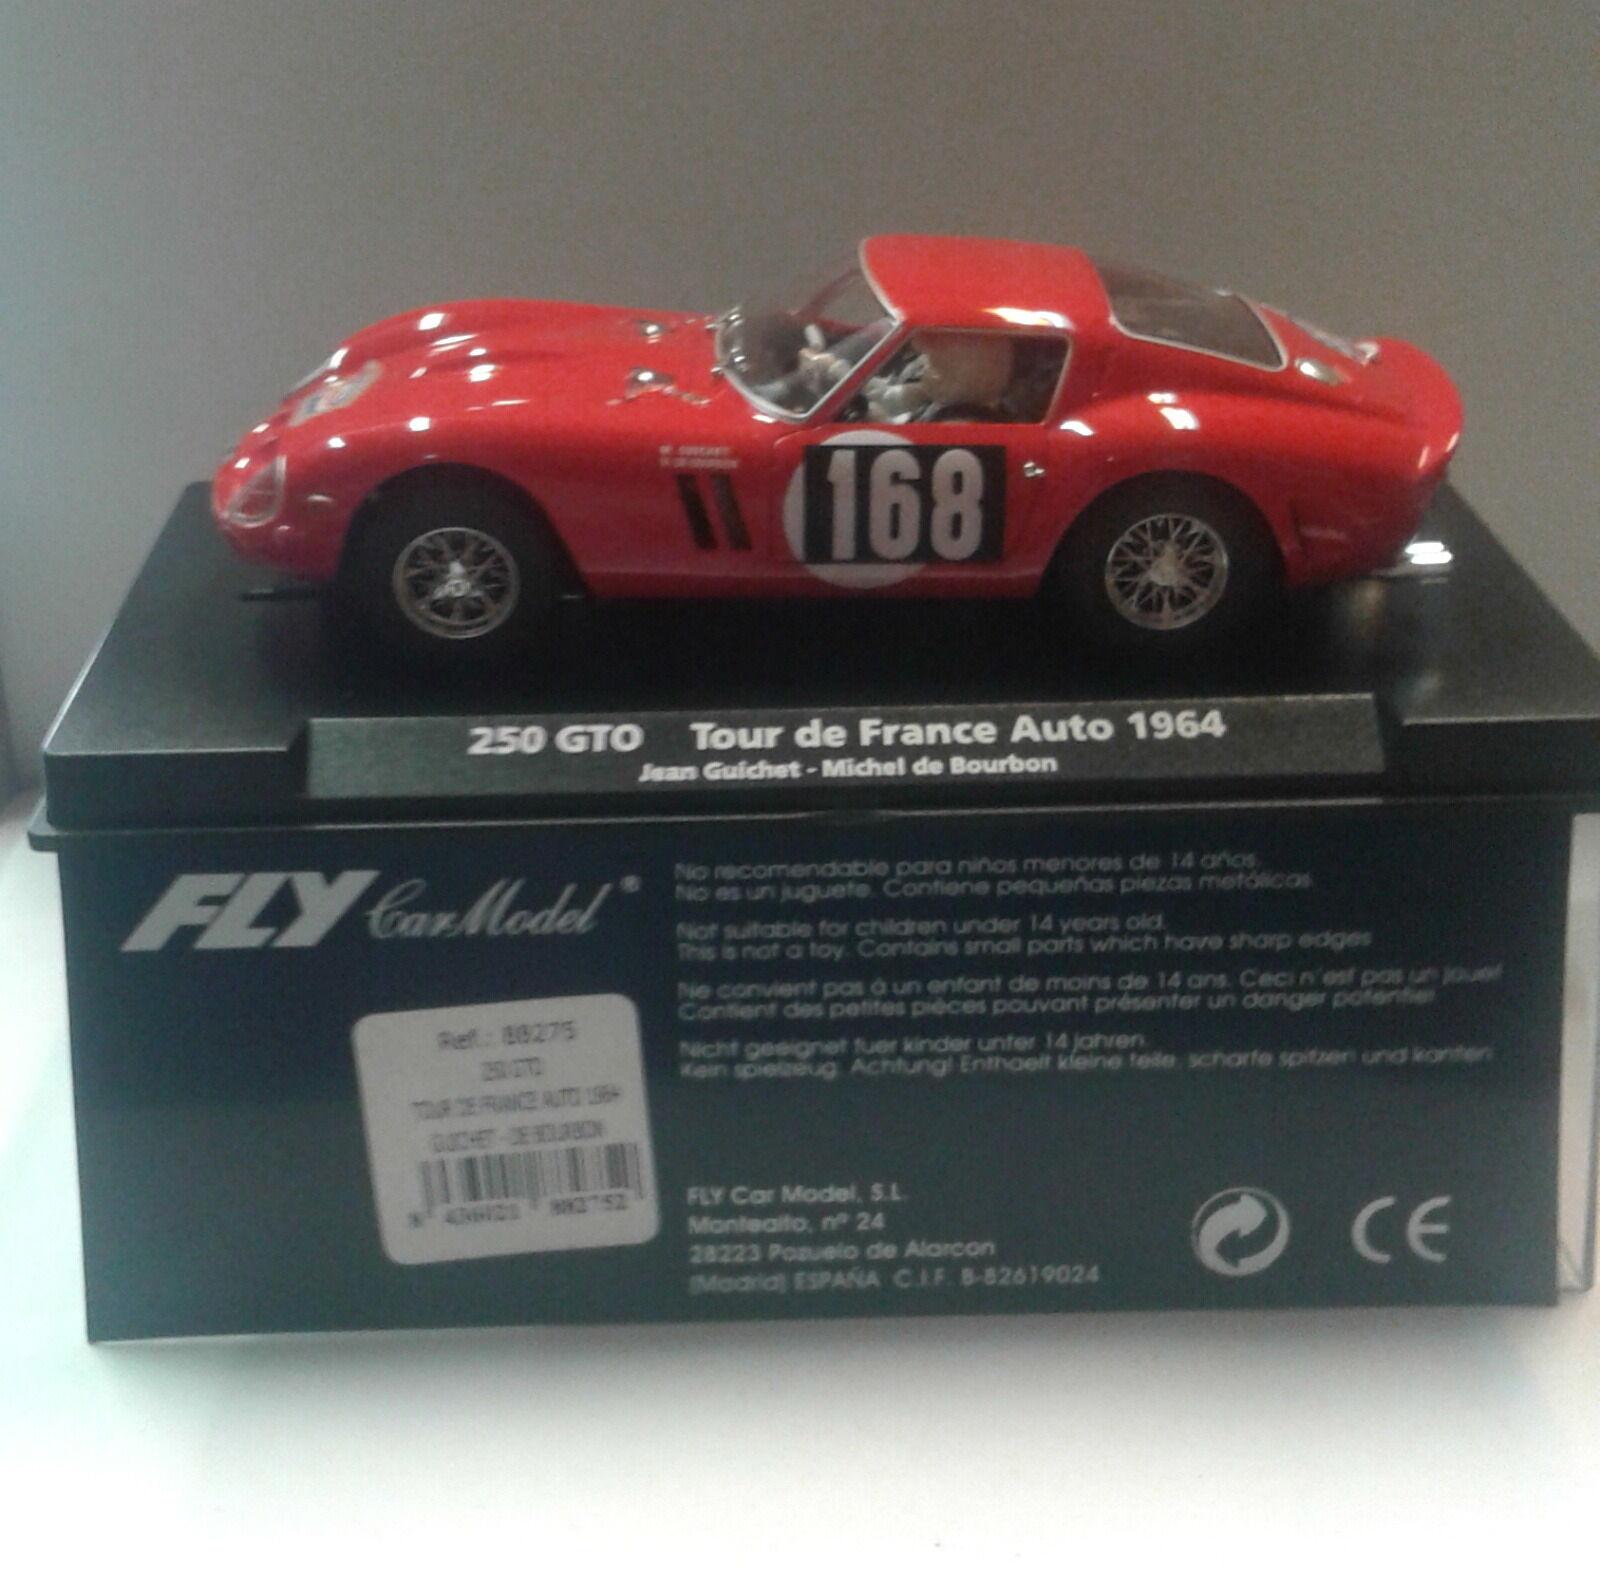 Qq 88275 FLY FERRARI 250 GTO TOUR FRANCE '64 GUICHET - BOURBON